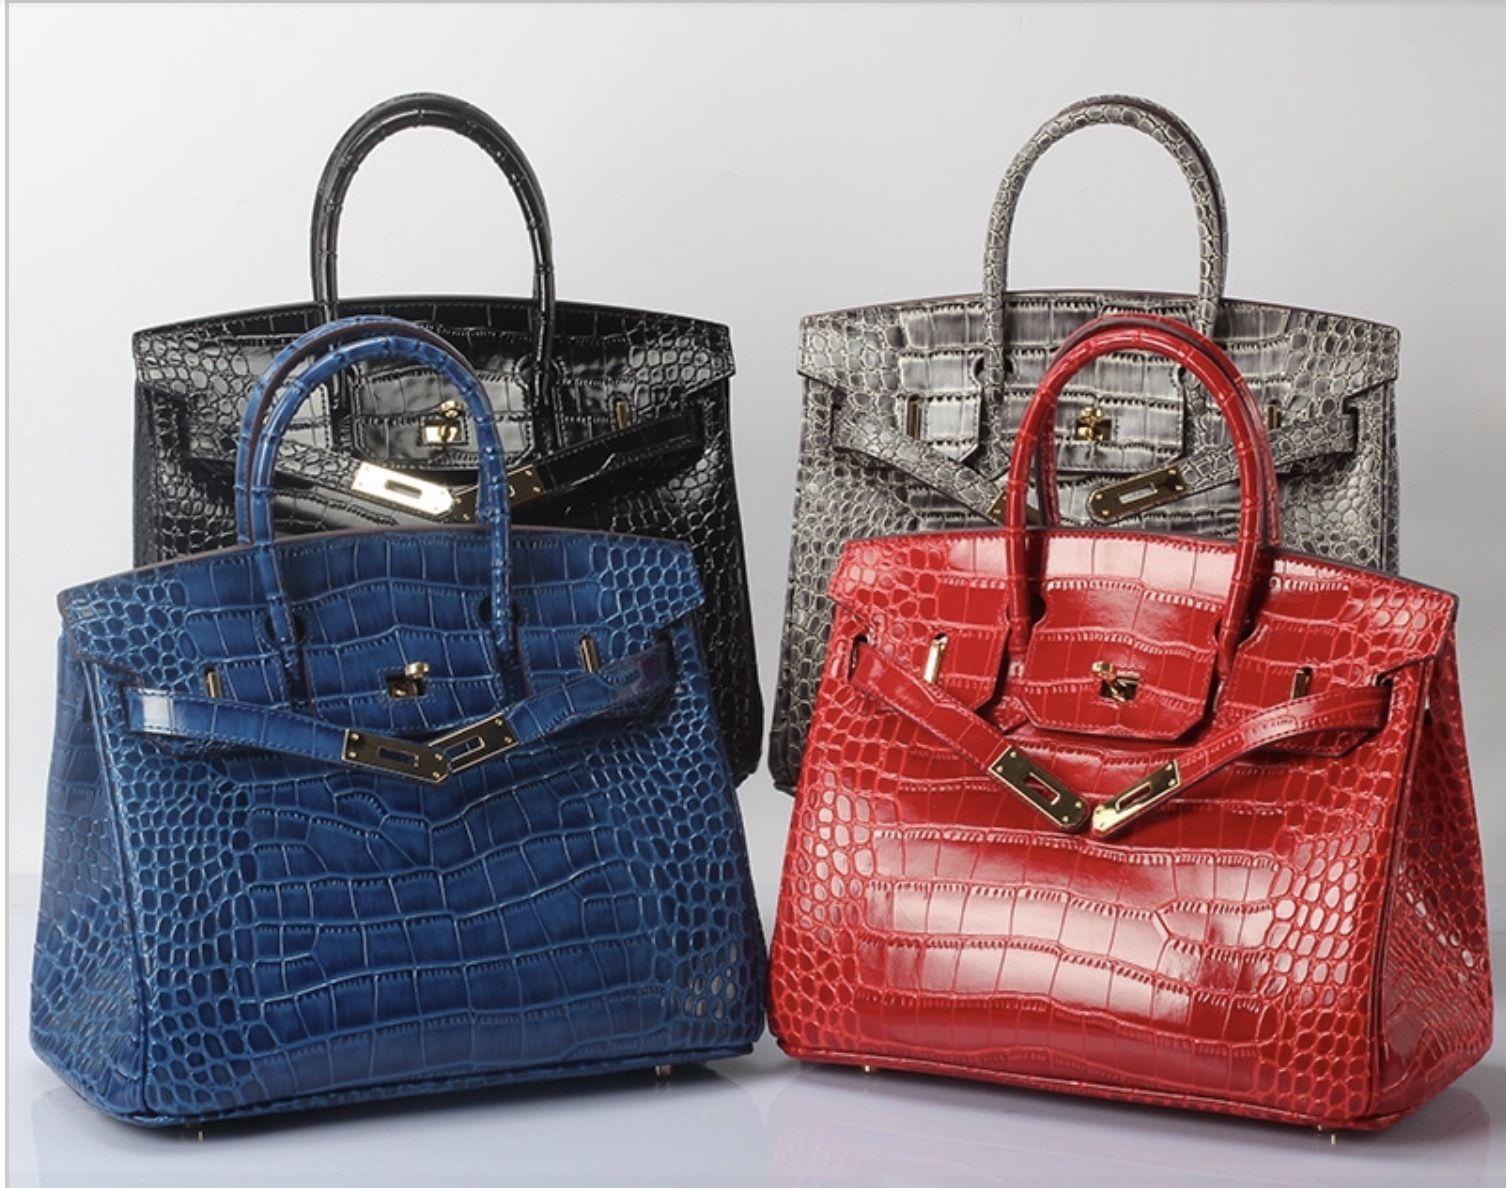 30cm Crocodile Pattern Birkin Style Italian Leather Bag Satchel Handbag 1632M